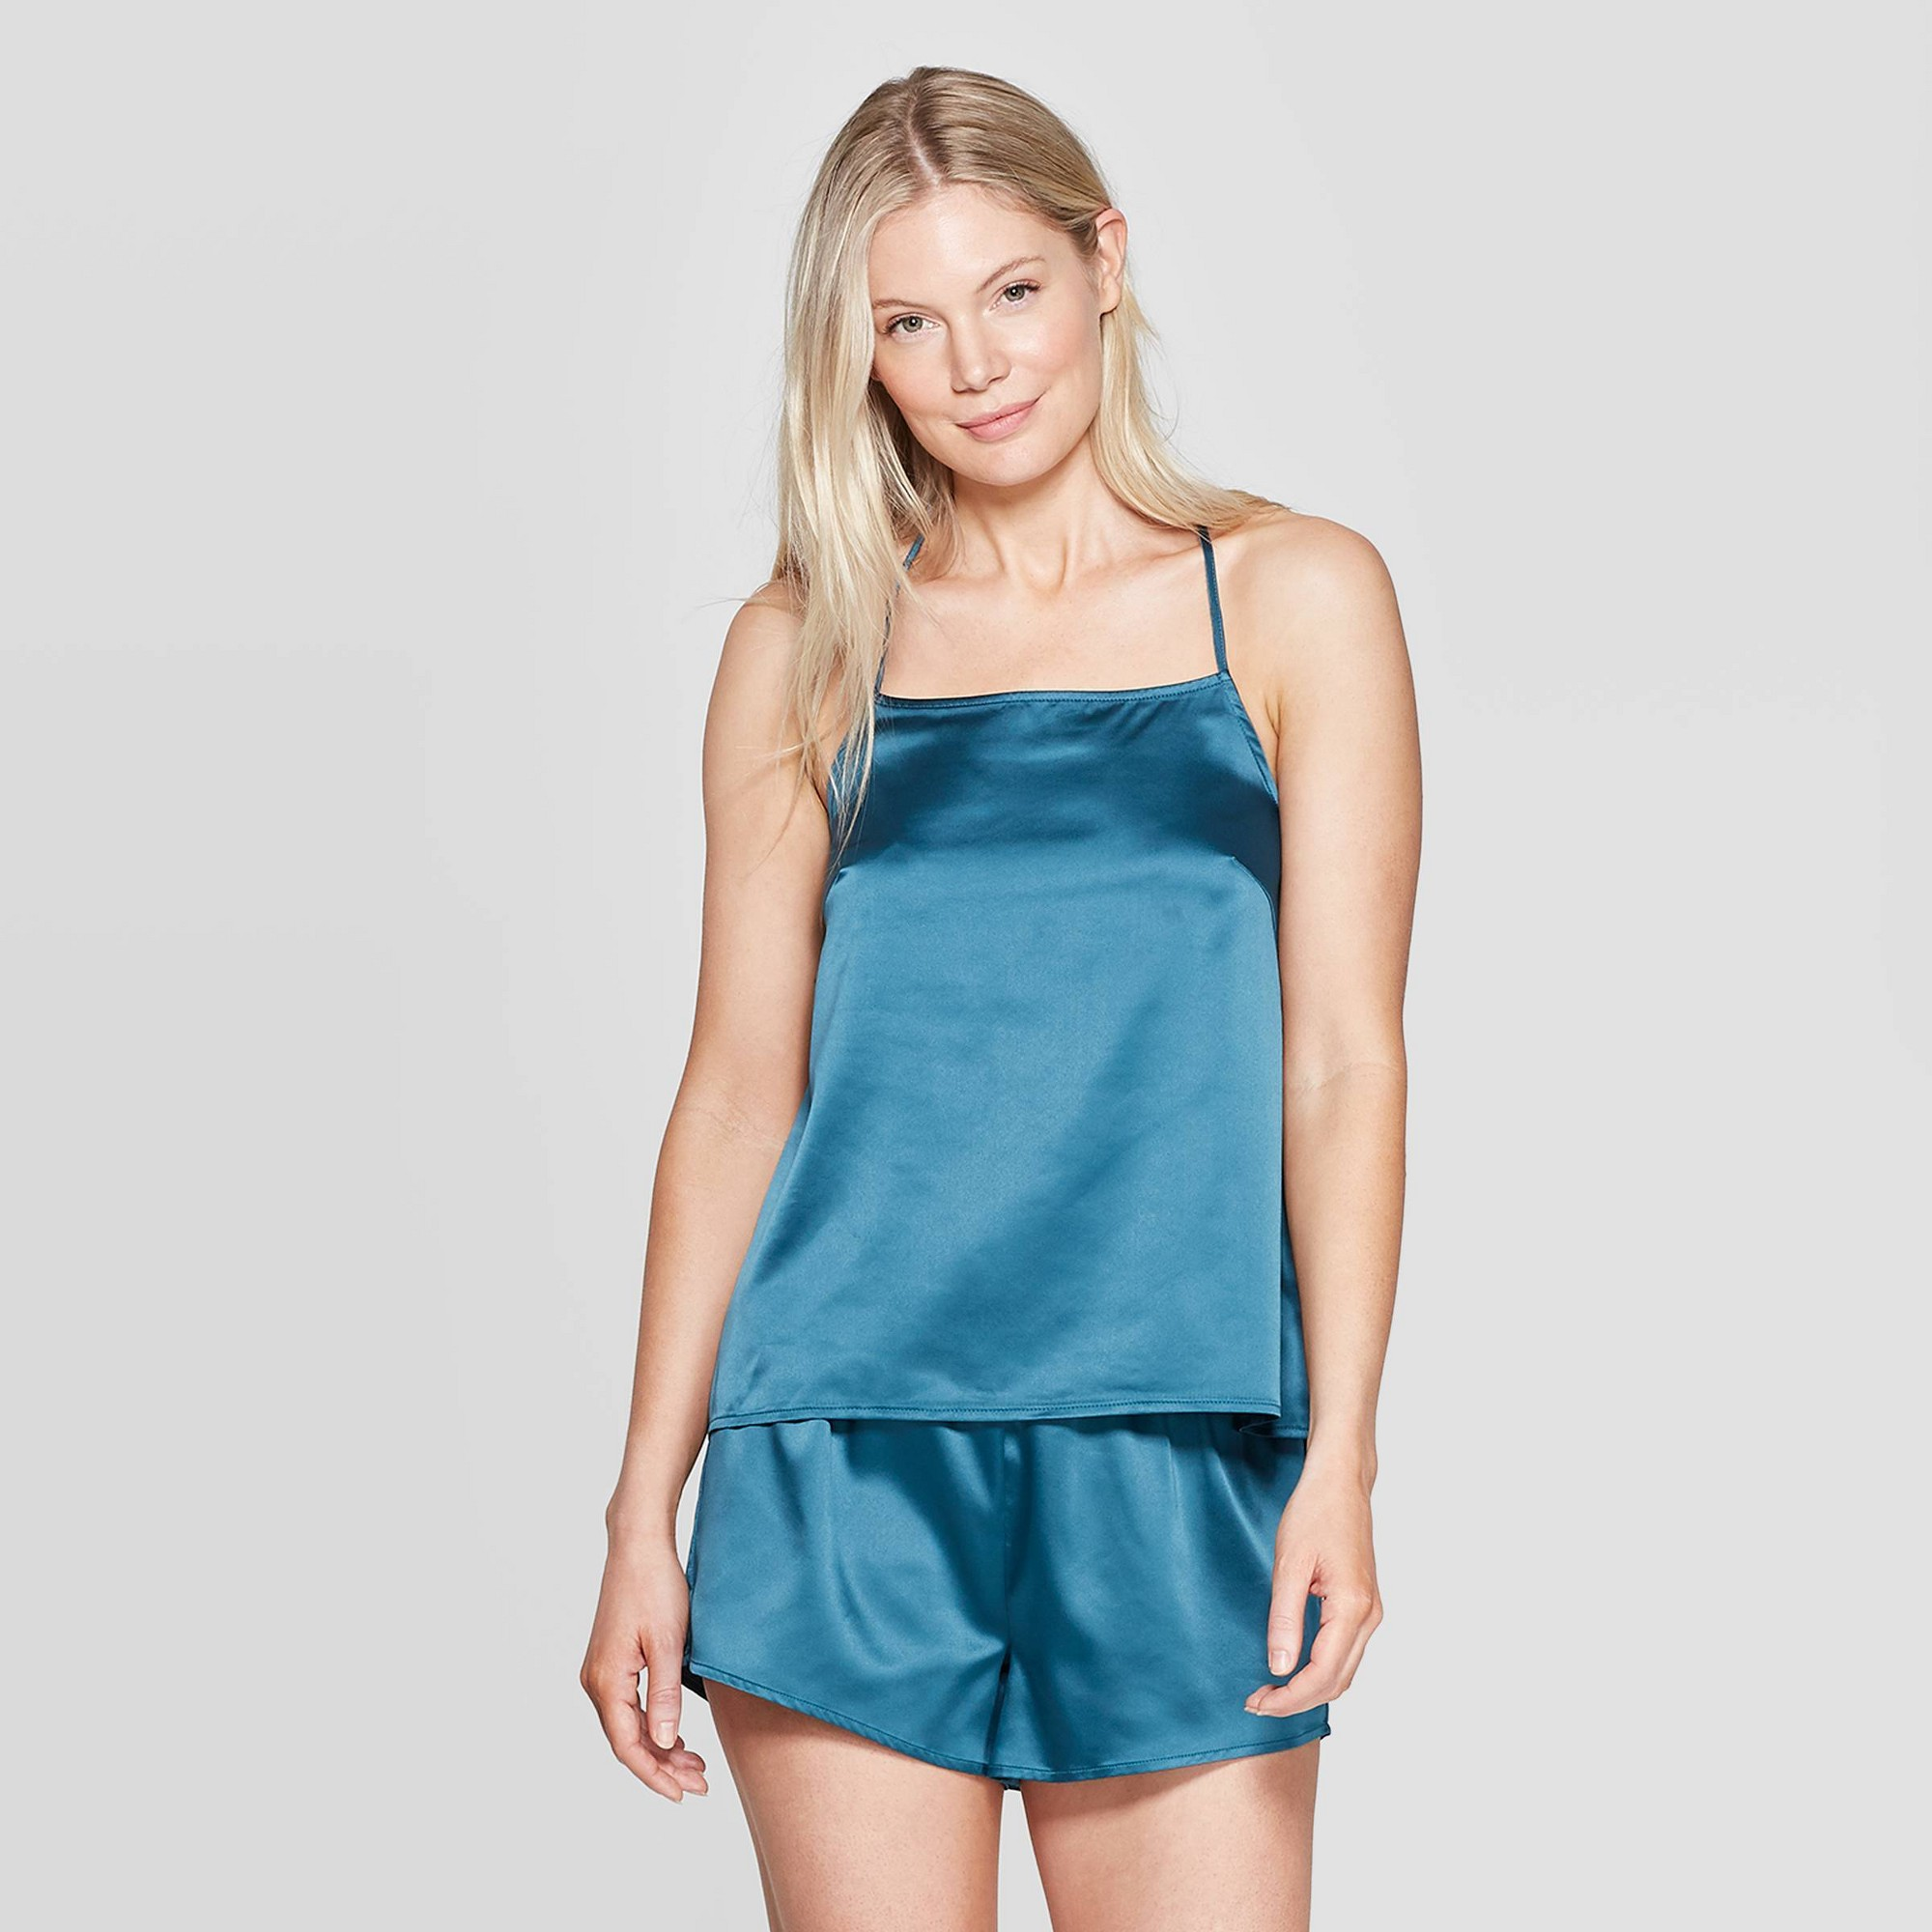 Women's Satin Sleep Camisole - Stars Above Teal (Blue) XS